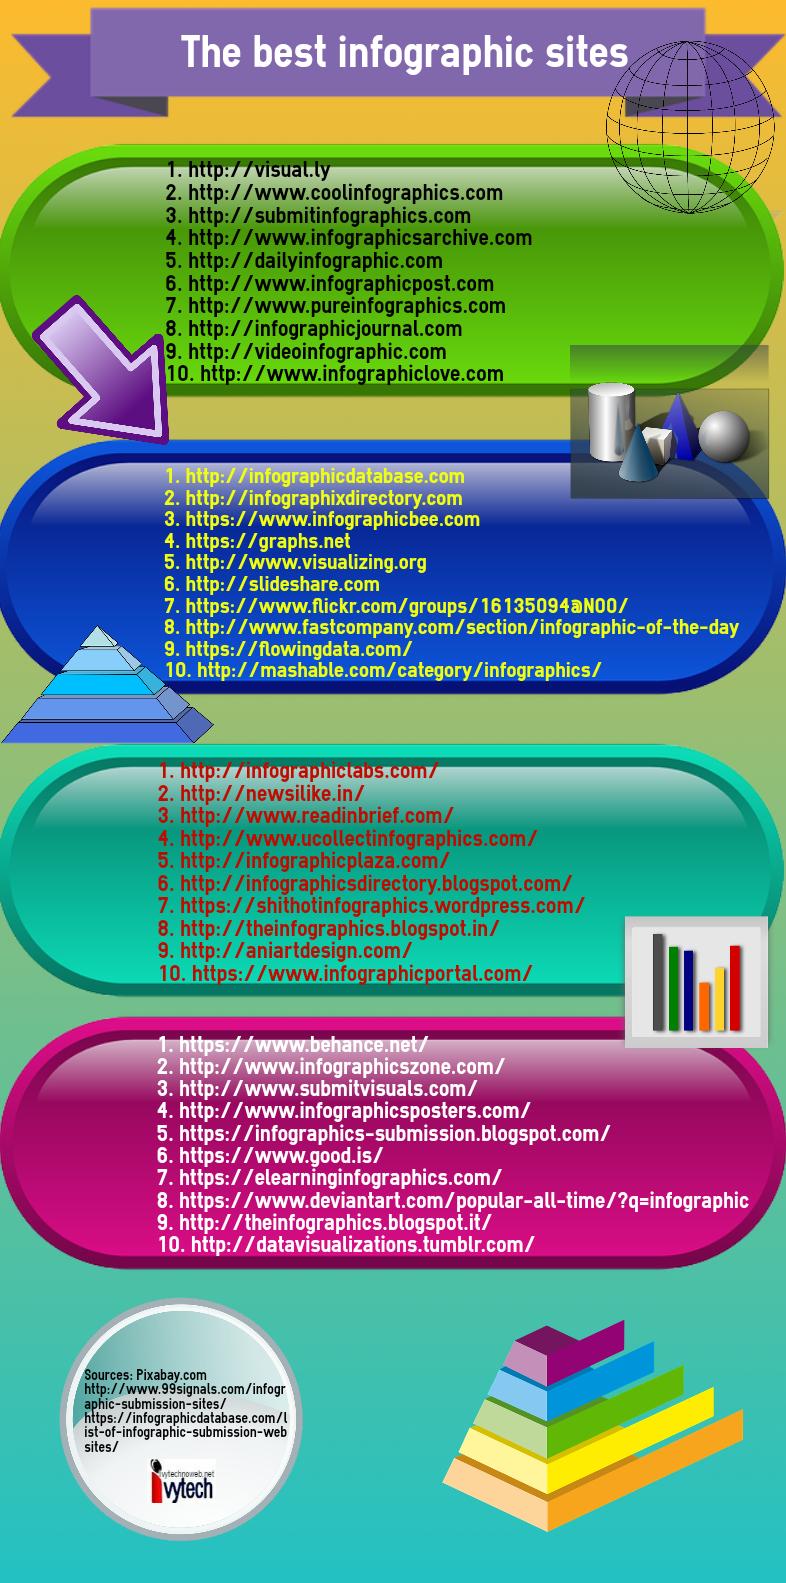 The best infographic sites-ivytechnoweb.net